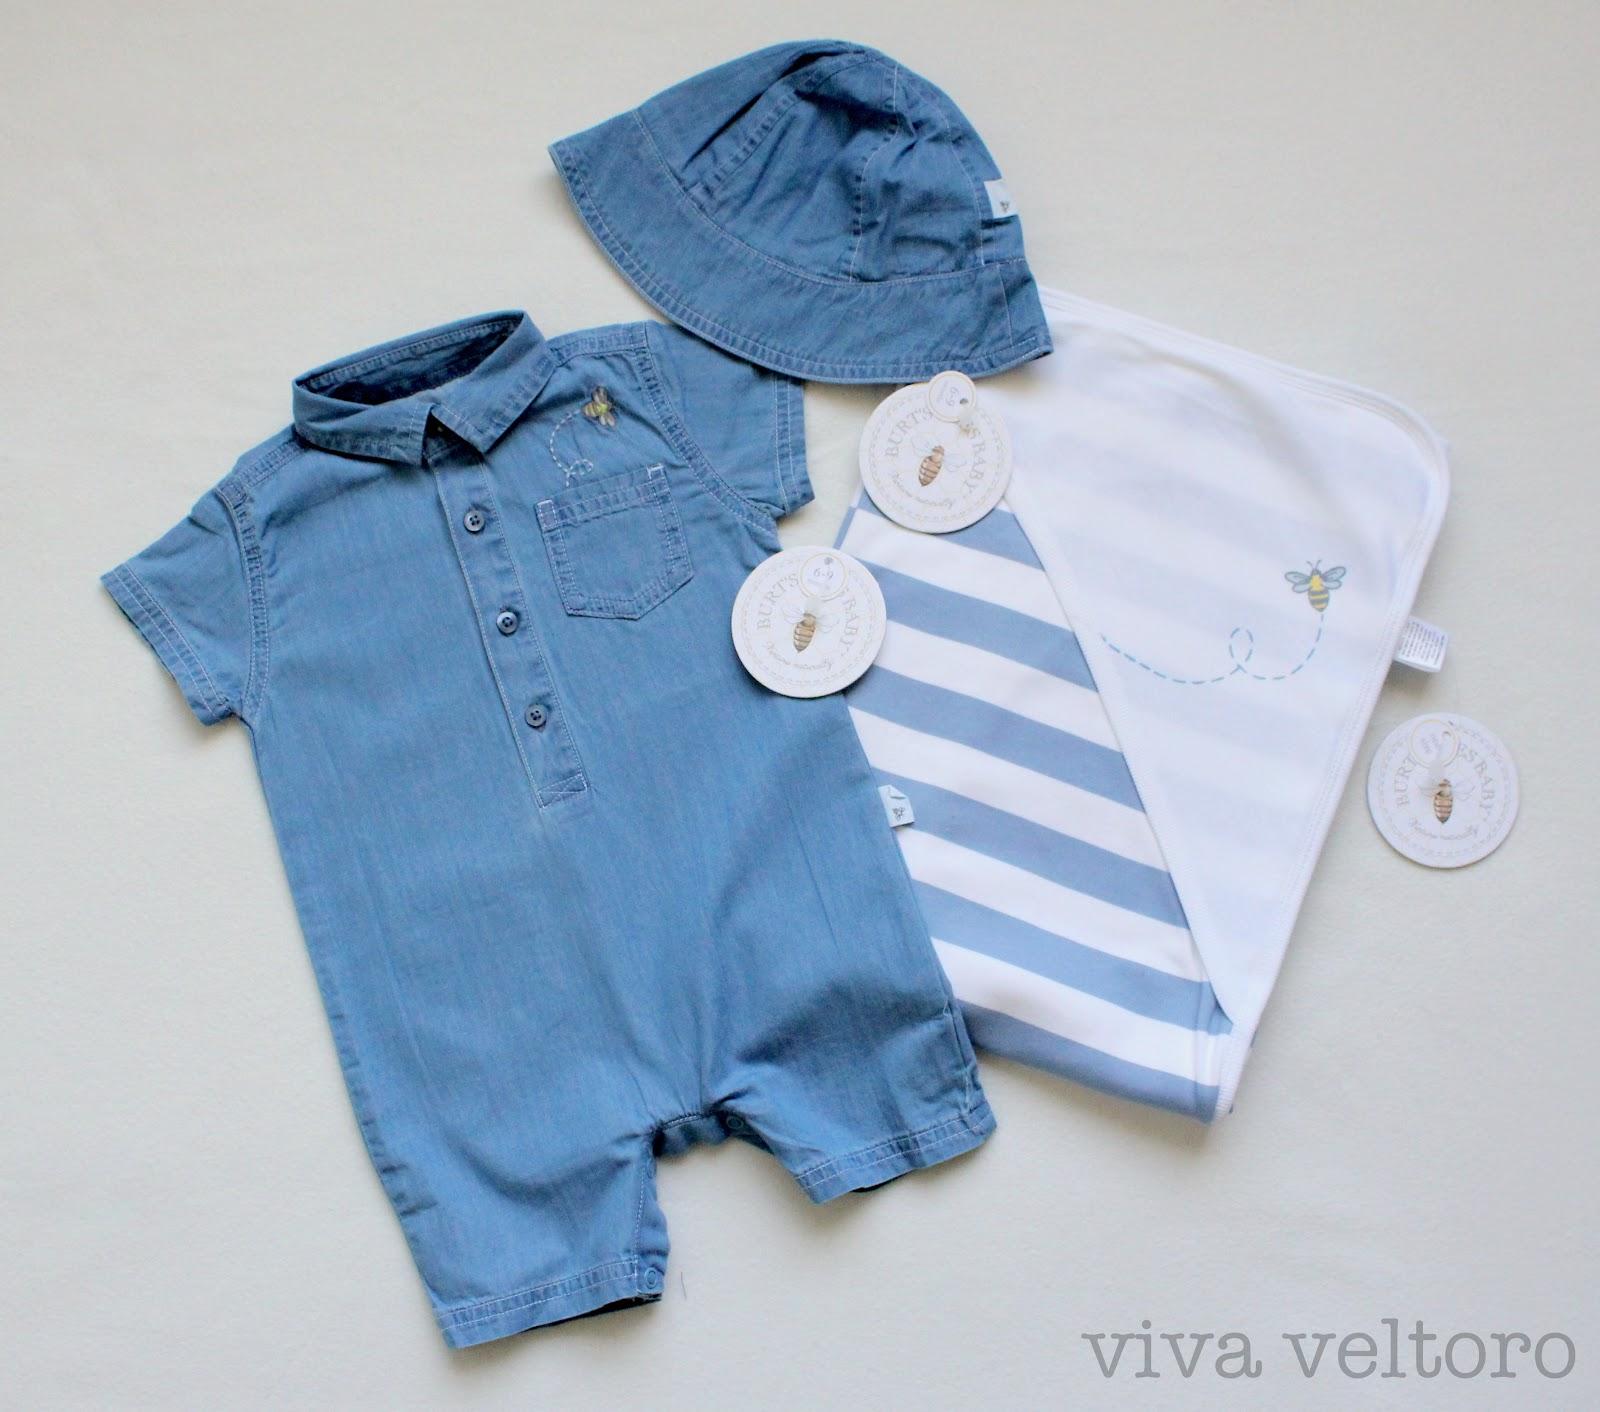 ad332cd46 Burt s Bees Baby Clothing Review - Viva Veltoro